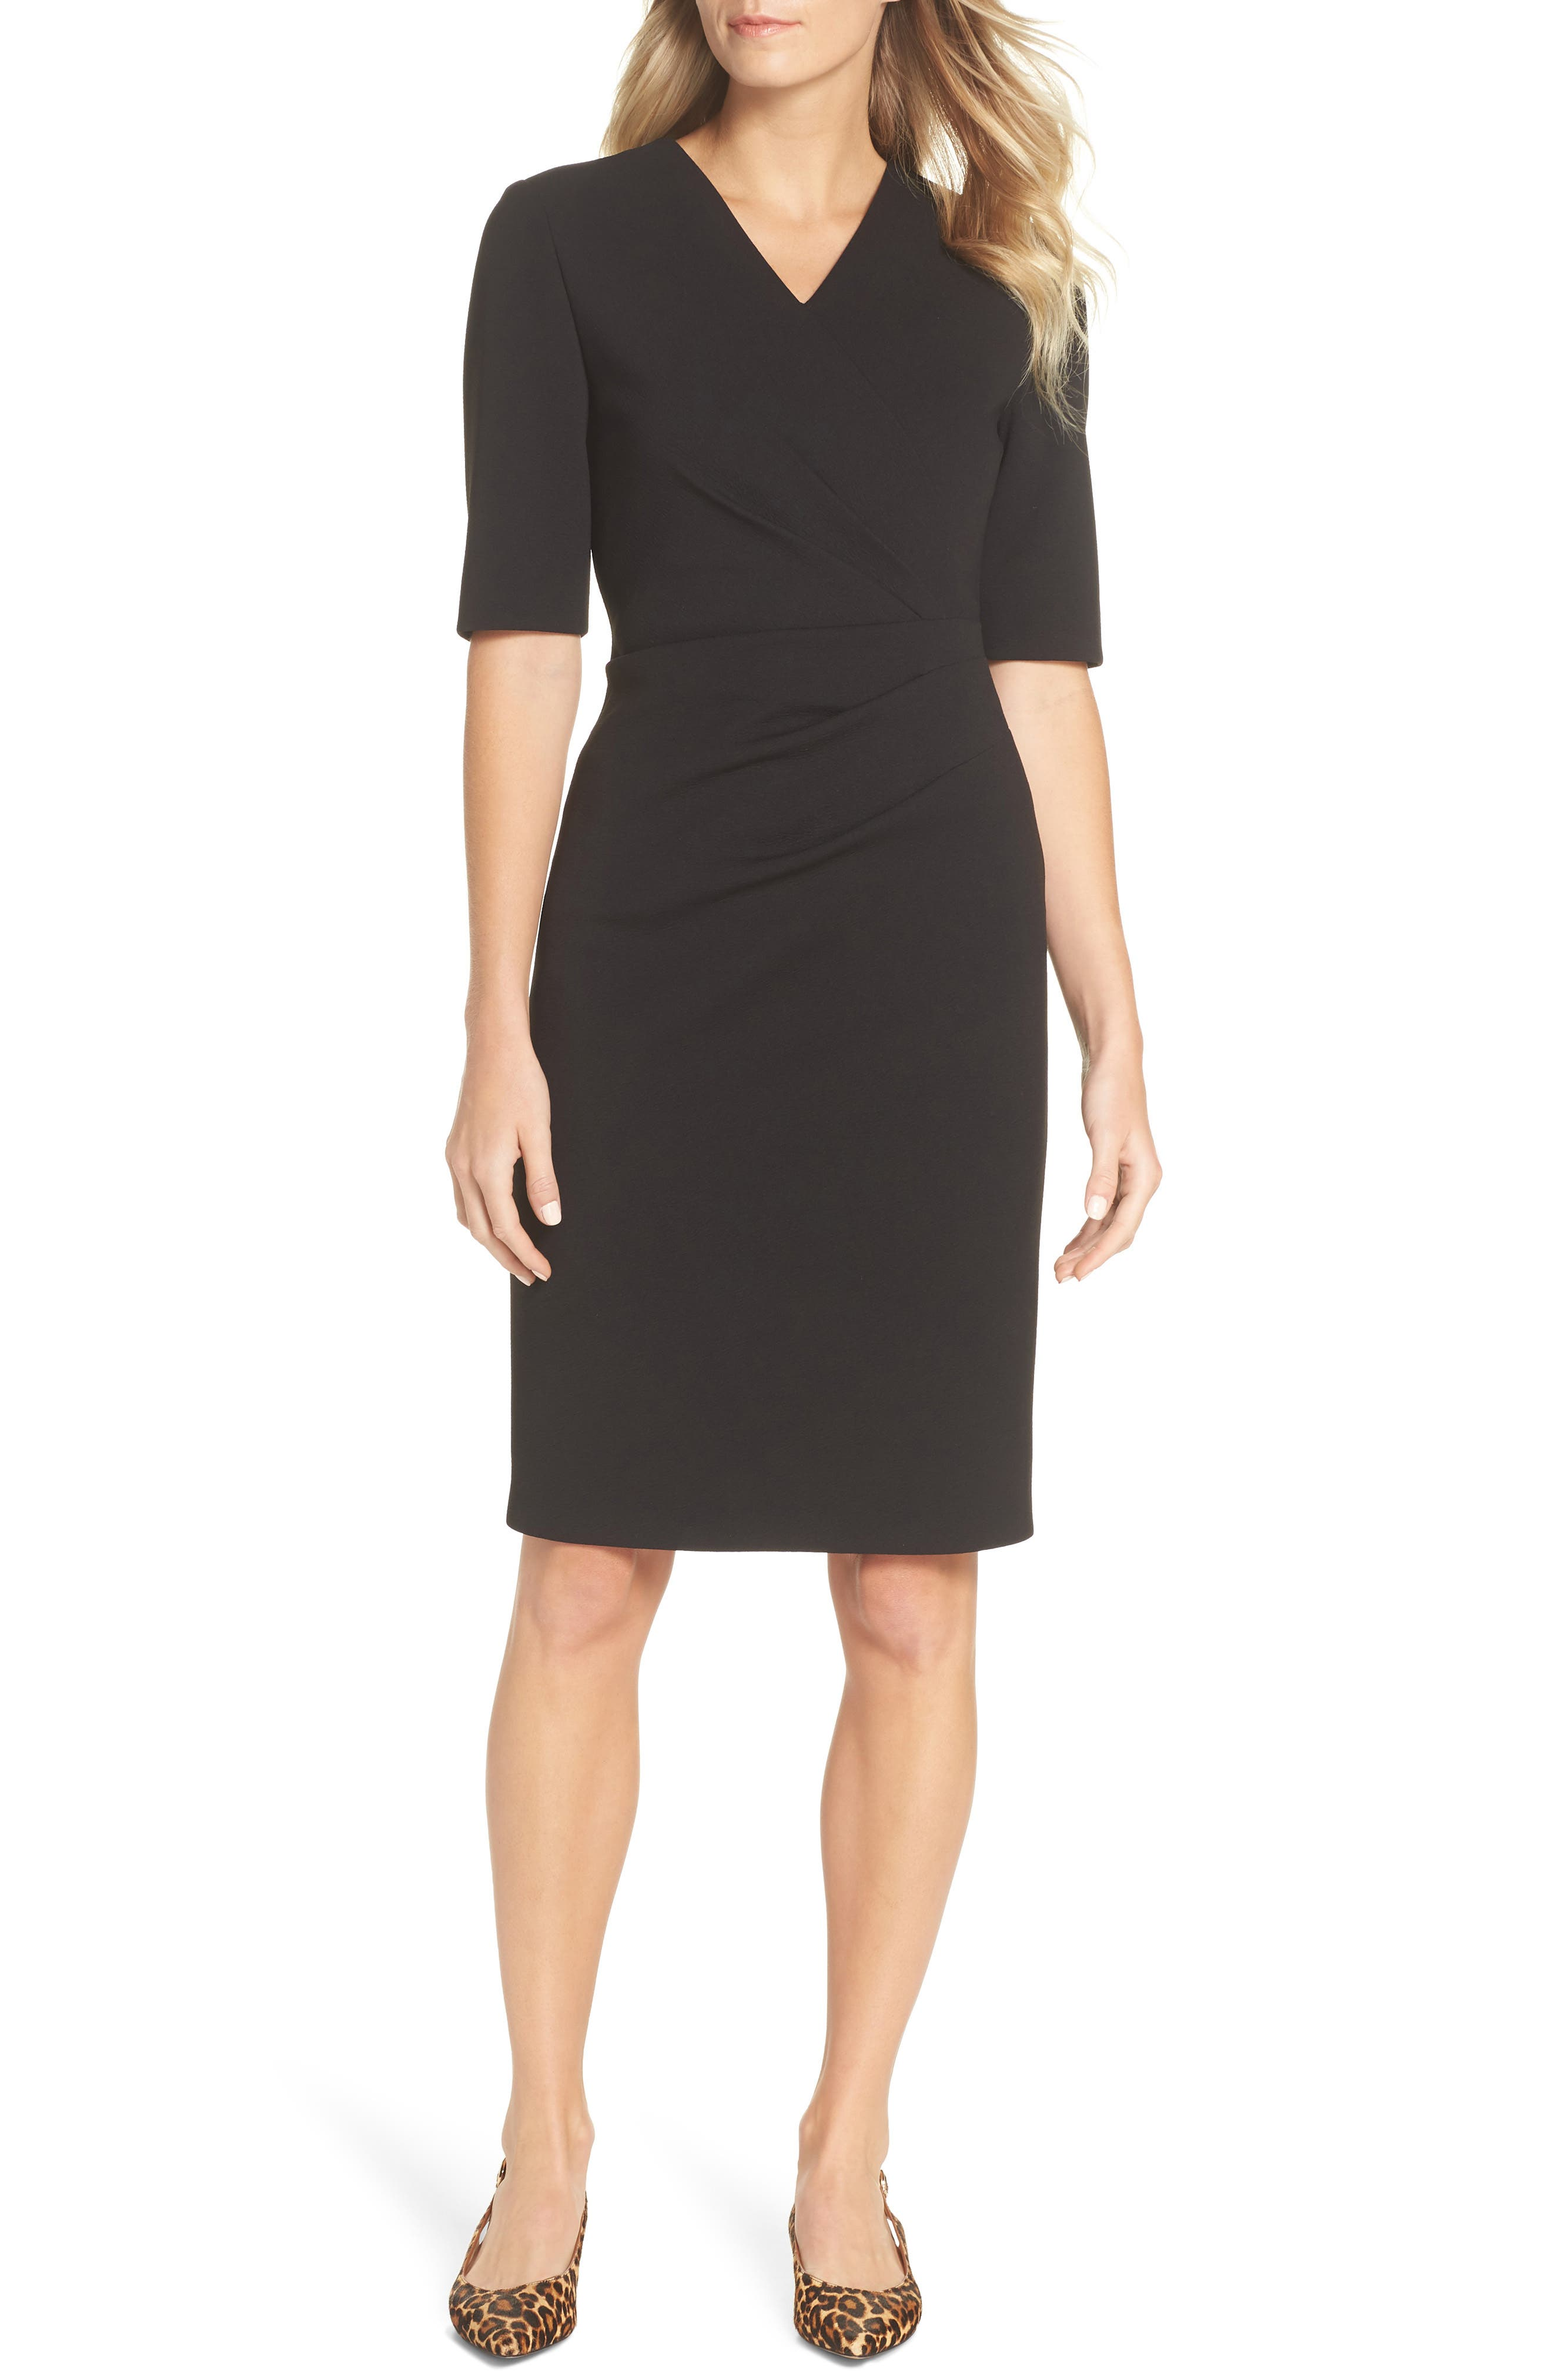 TAHARI Scuba Crepe Sheath Dress, Main, color, BLACK